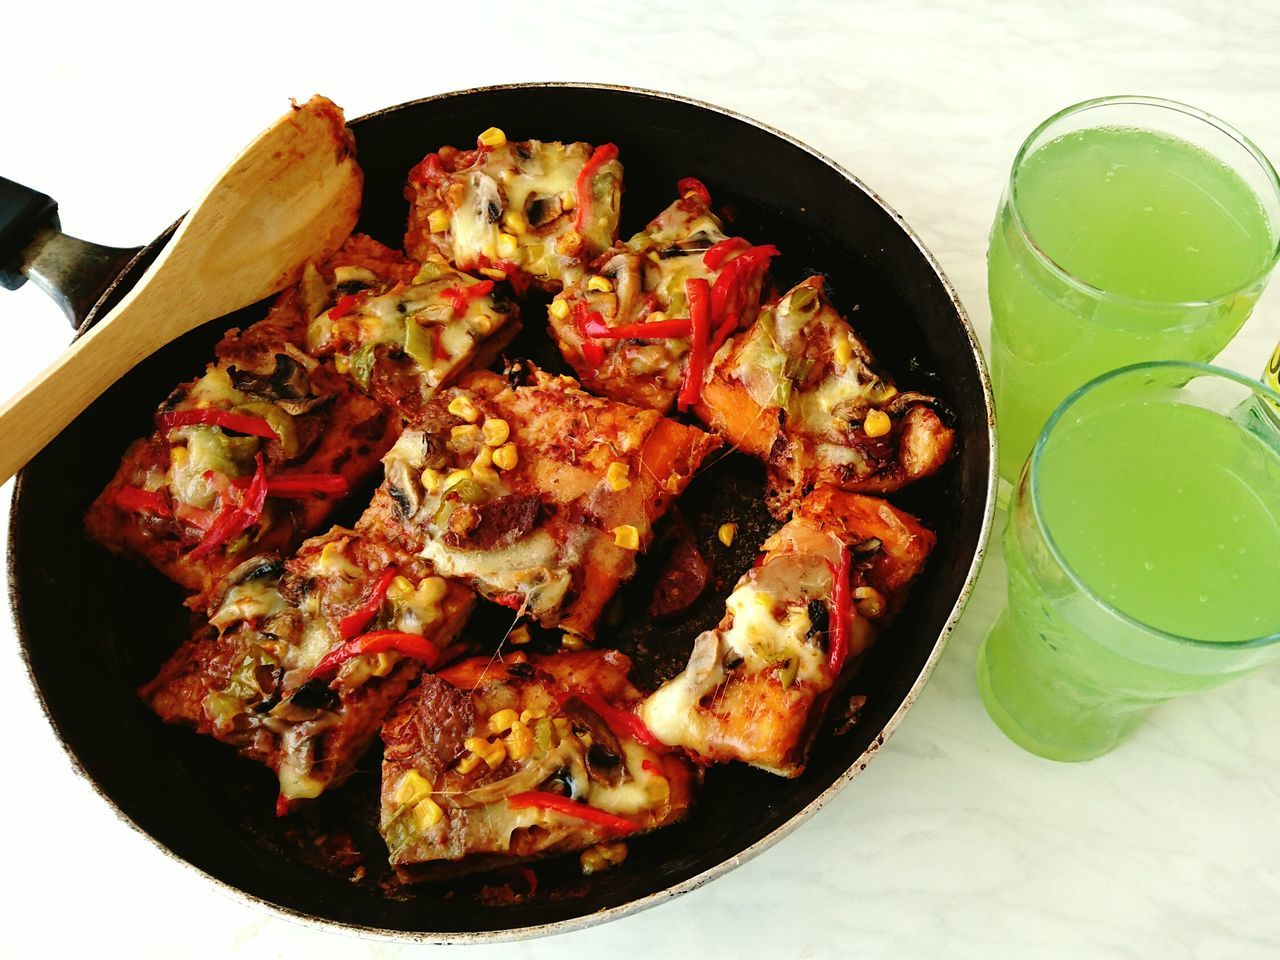 Food Food And Drink Ready-to-eat Healthy Eating Sausage Pizza Pizza Time Homemadepizza Schweppes Bitter Lemon Schweppes Greendrink Onthetable Meal Couple Delicious EyeEm Best Shots Eyeemfood Eyeemfoodlover Eyeemfoodporn